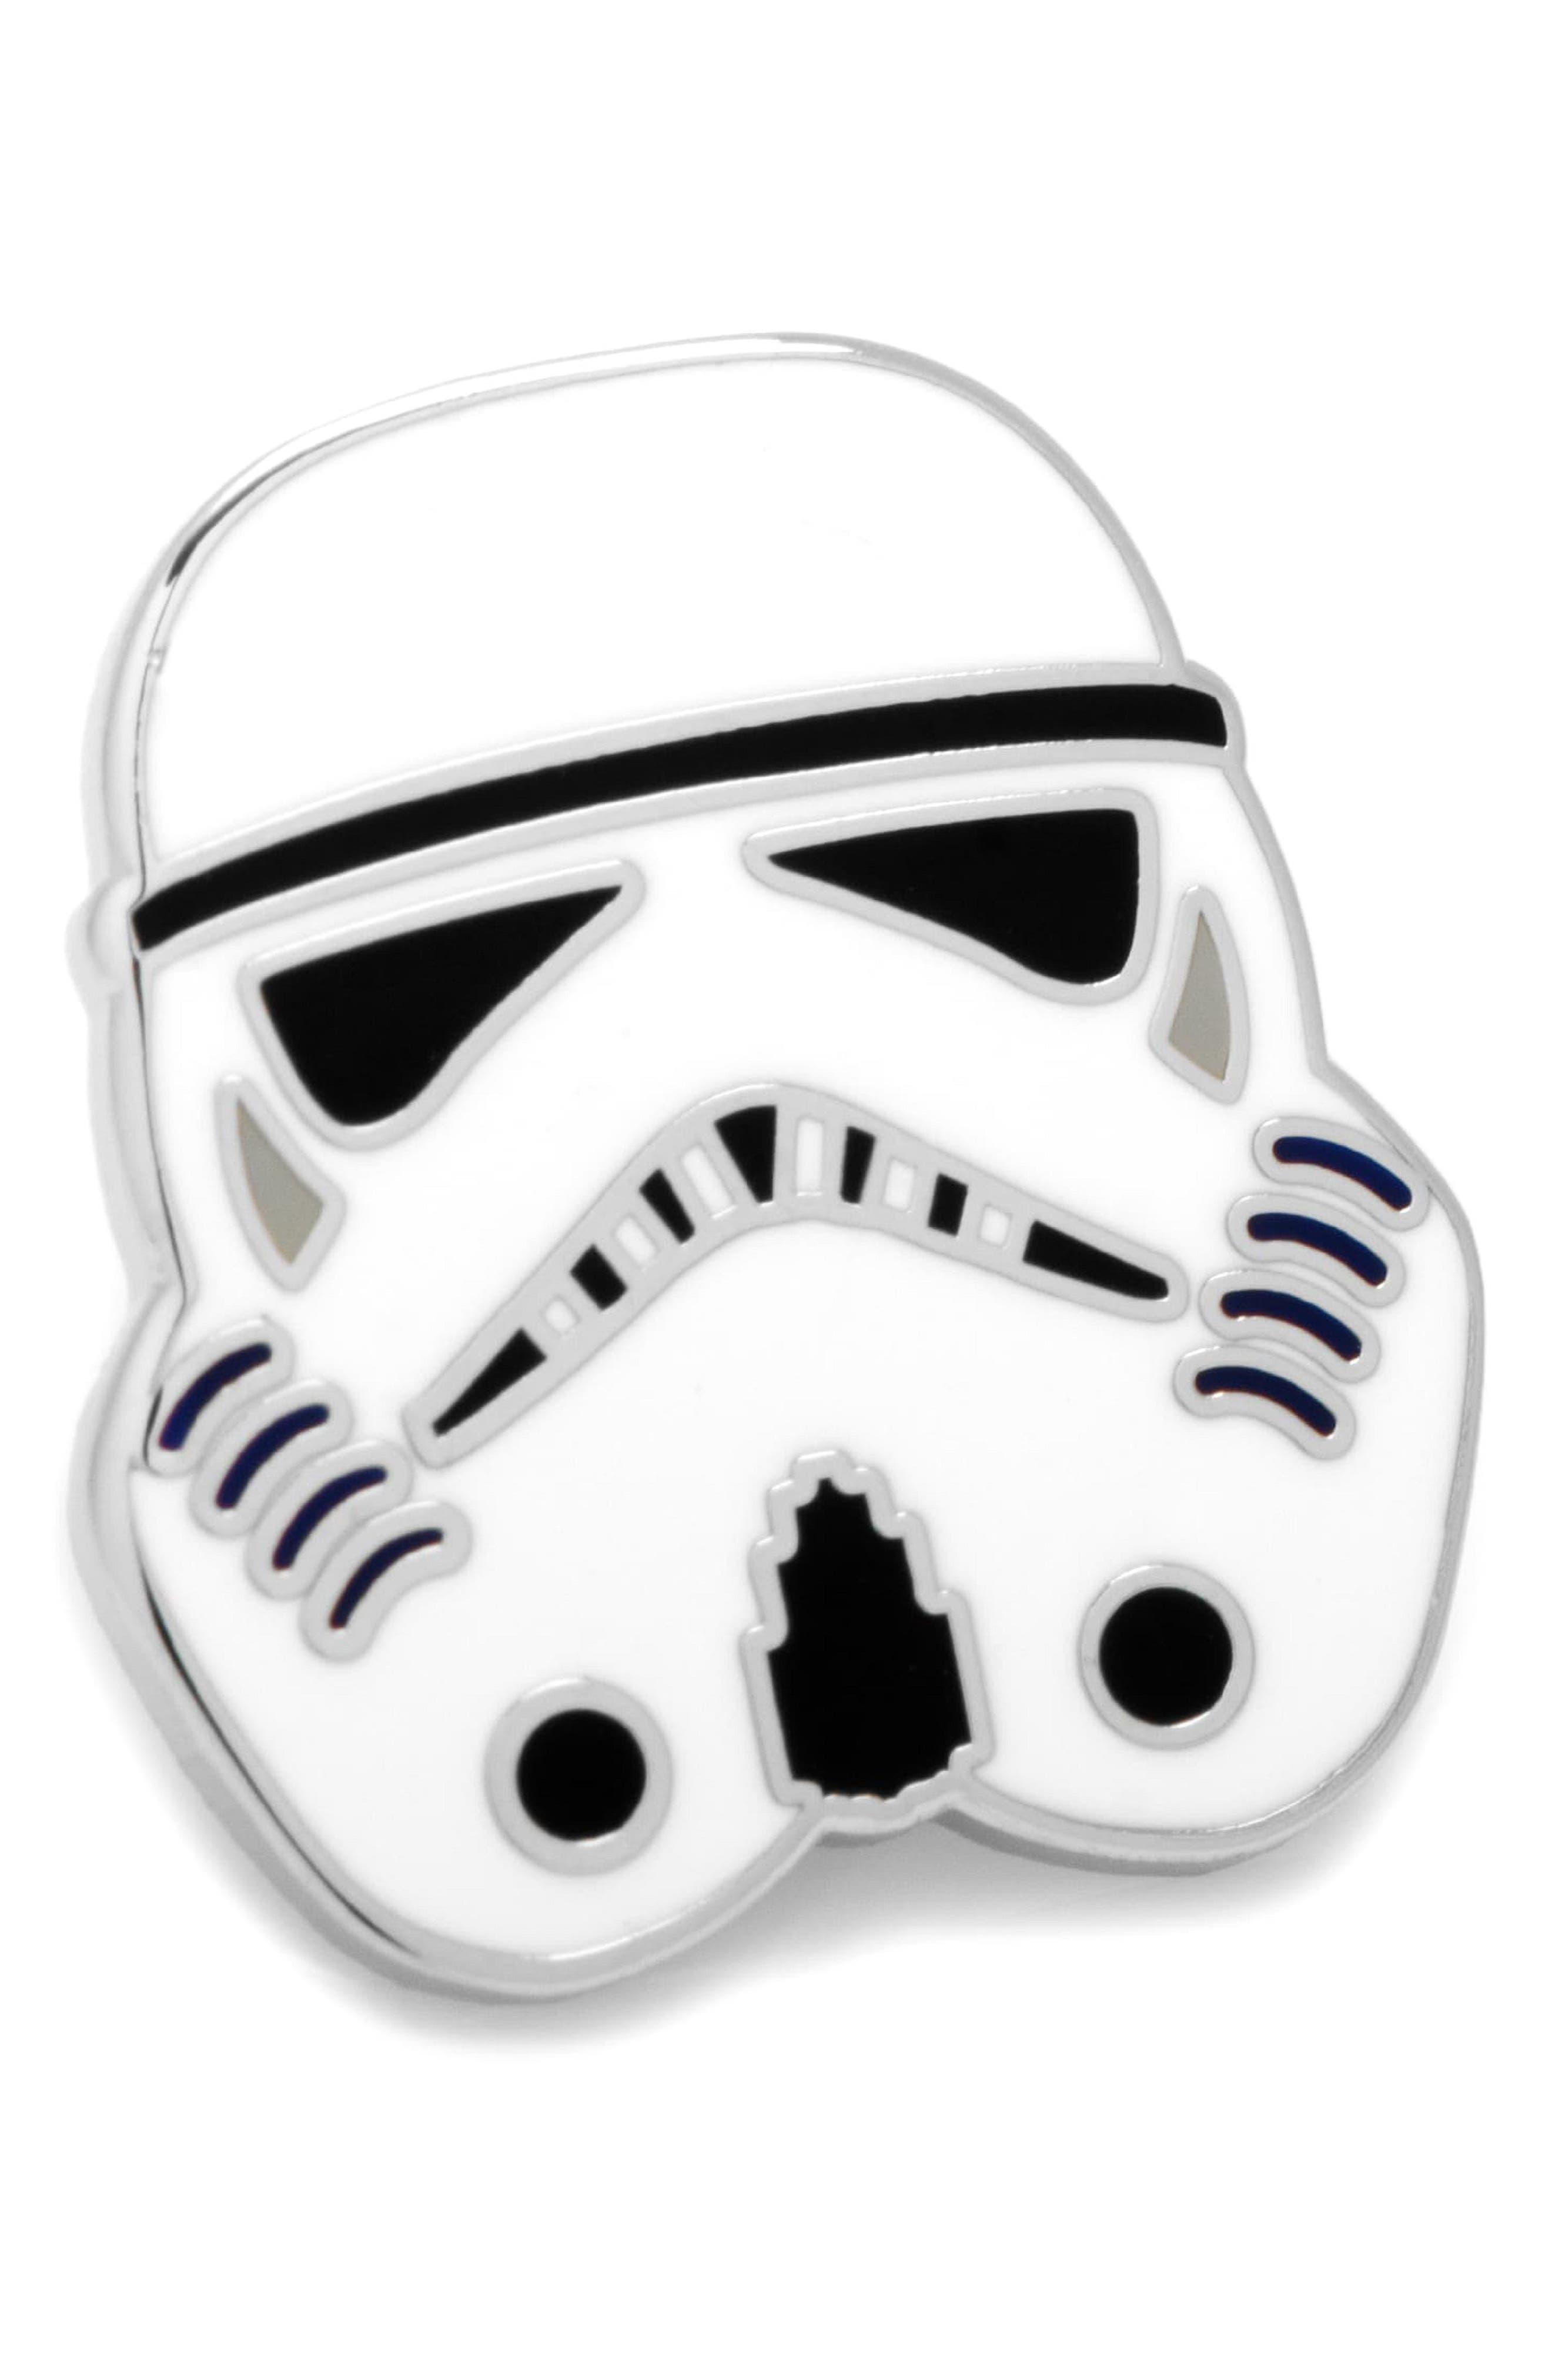 Star Wars<sup>™</sup> - Stormtrooper Lapel Pin,                         Main,                         color, 040